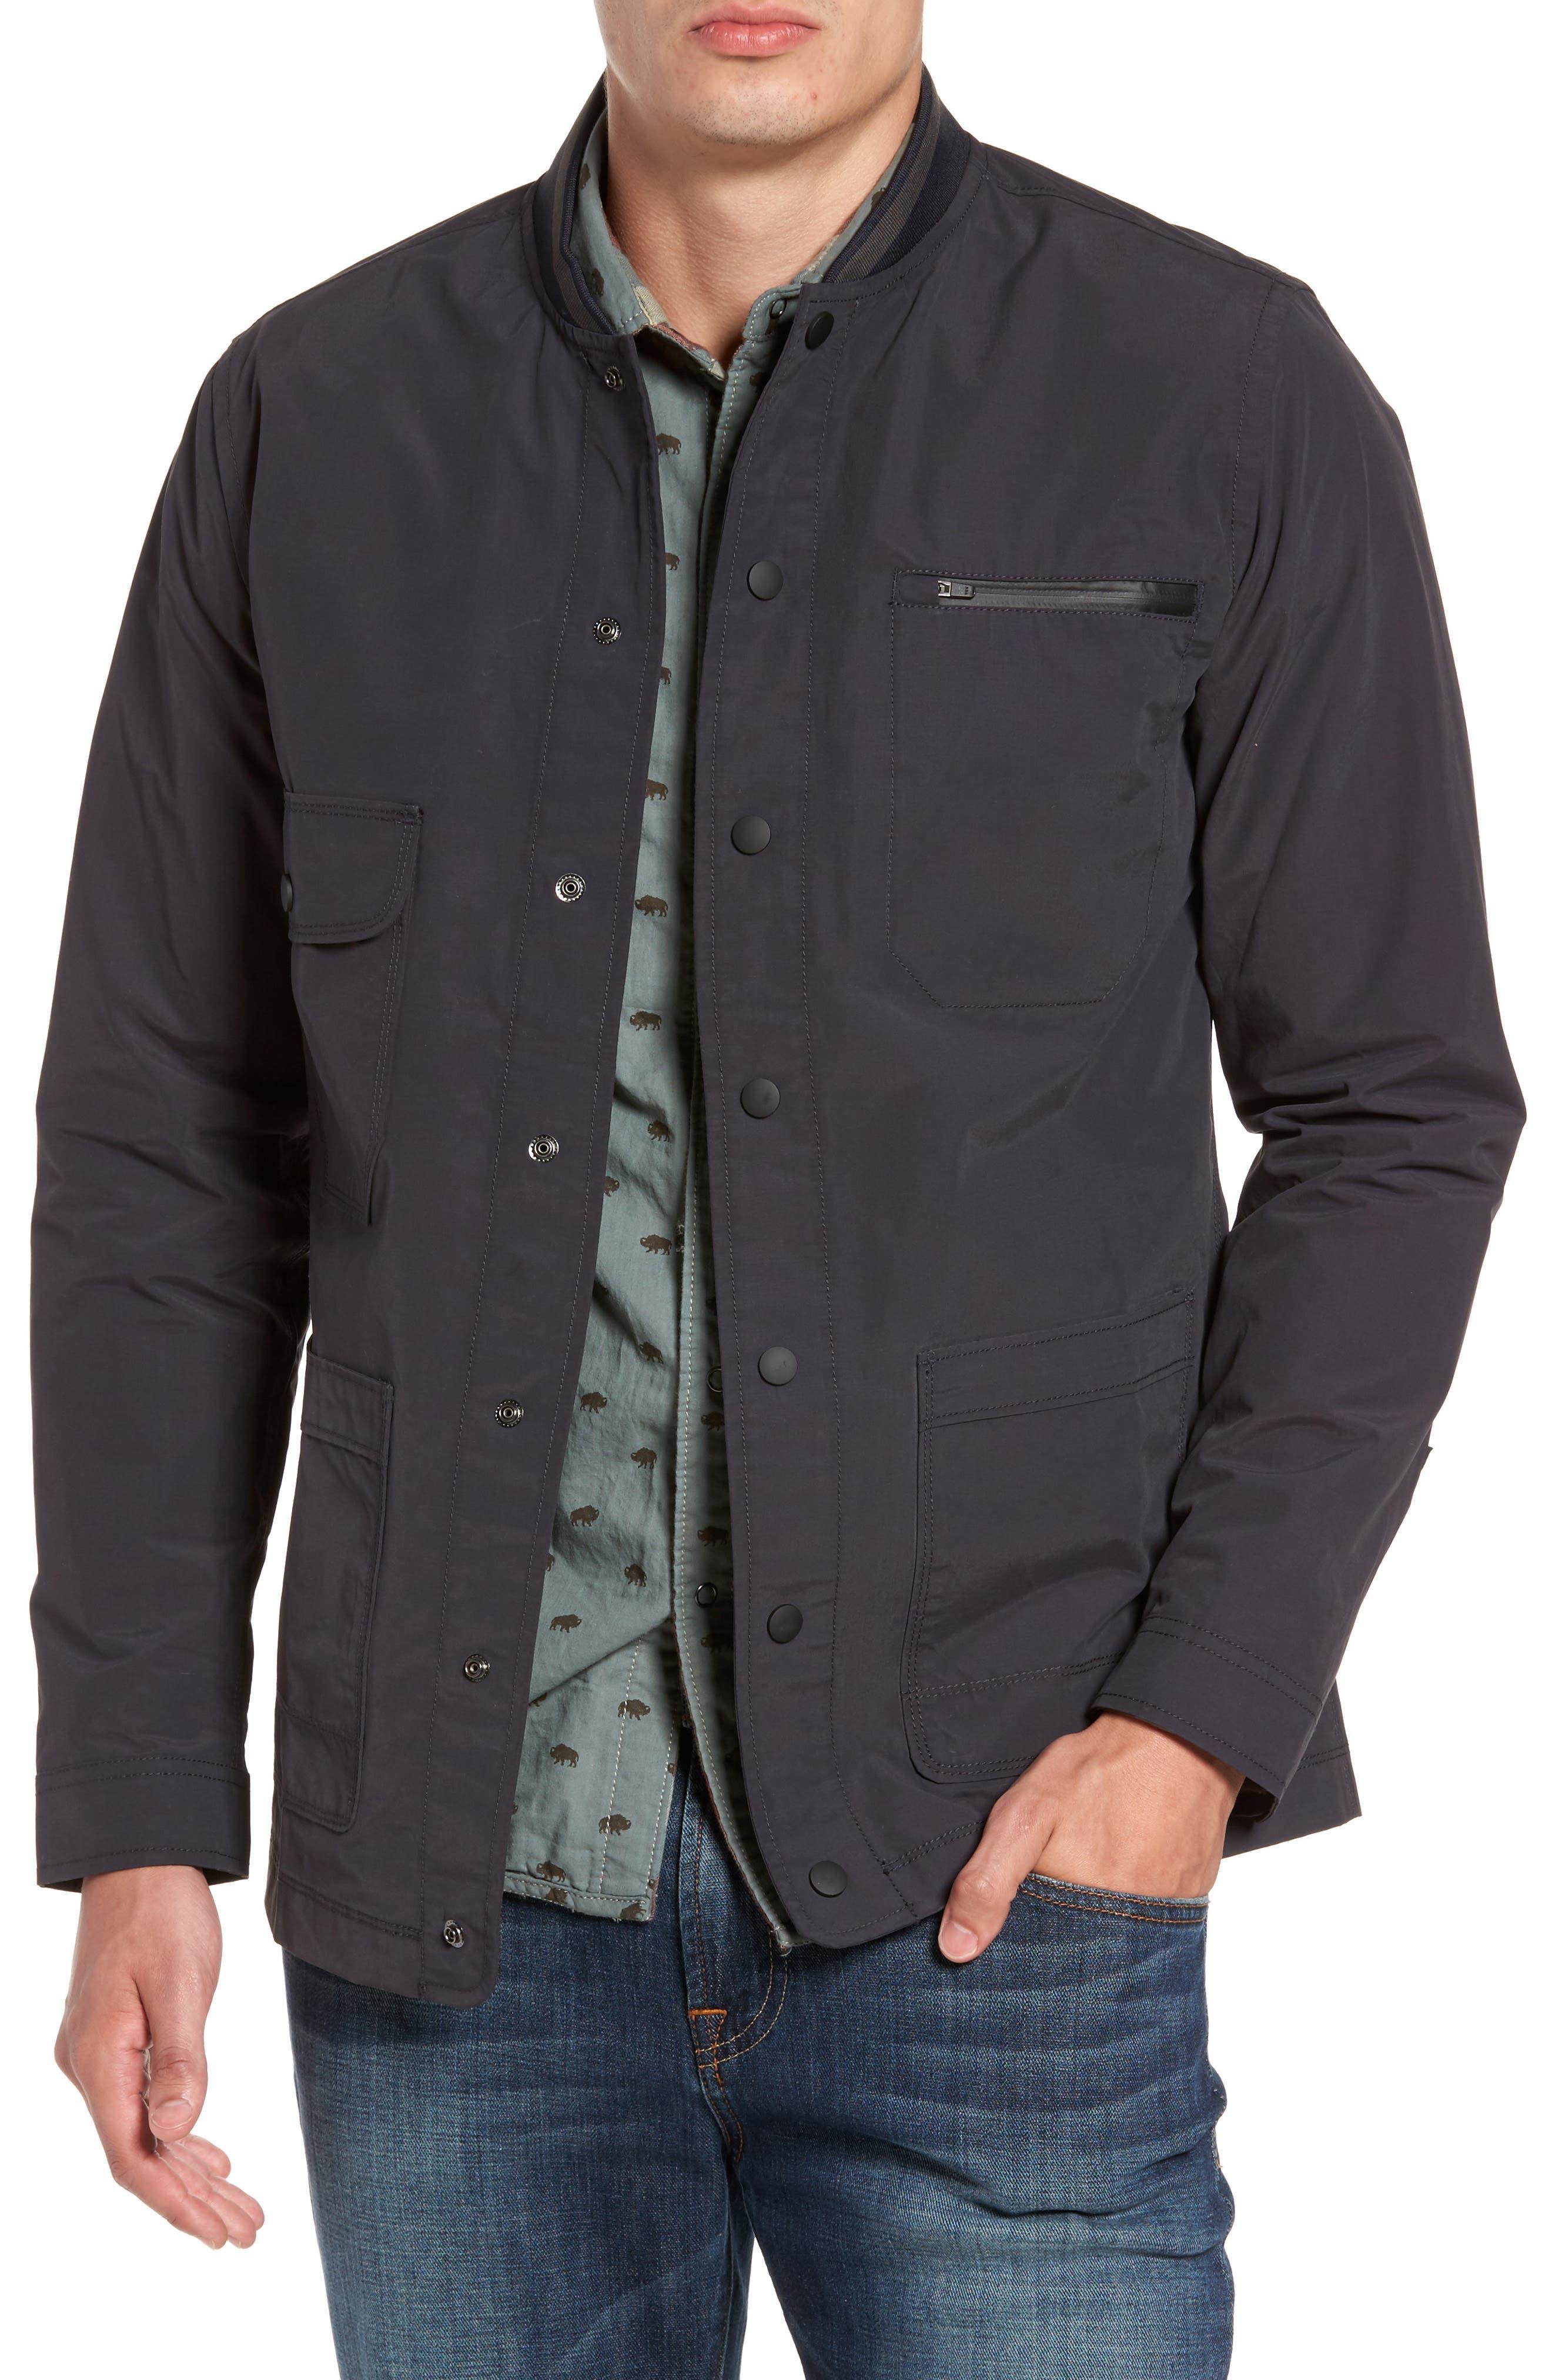 Main Image - Jeremiah Jarvis Coated Cotton Blend Jacket